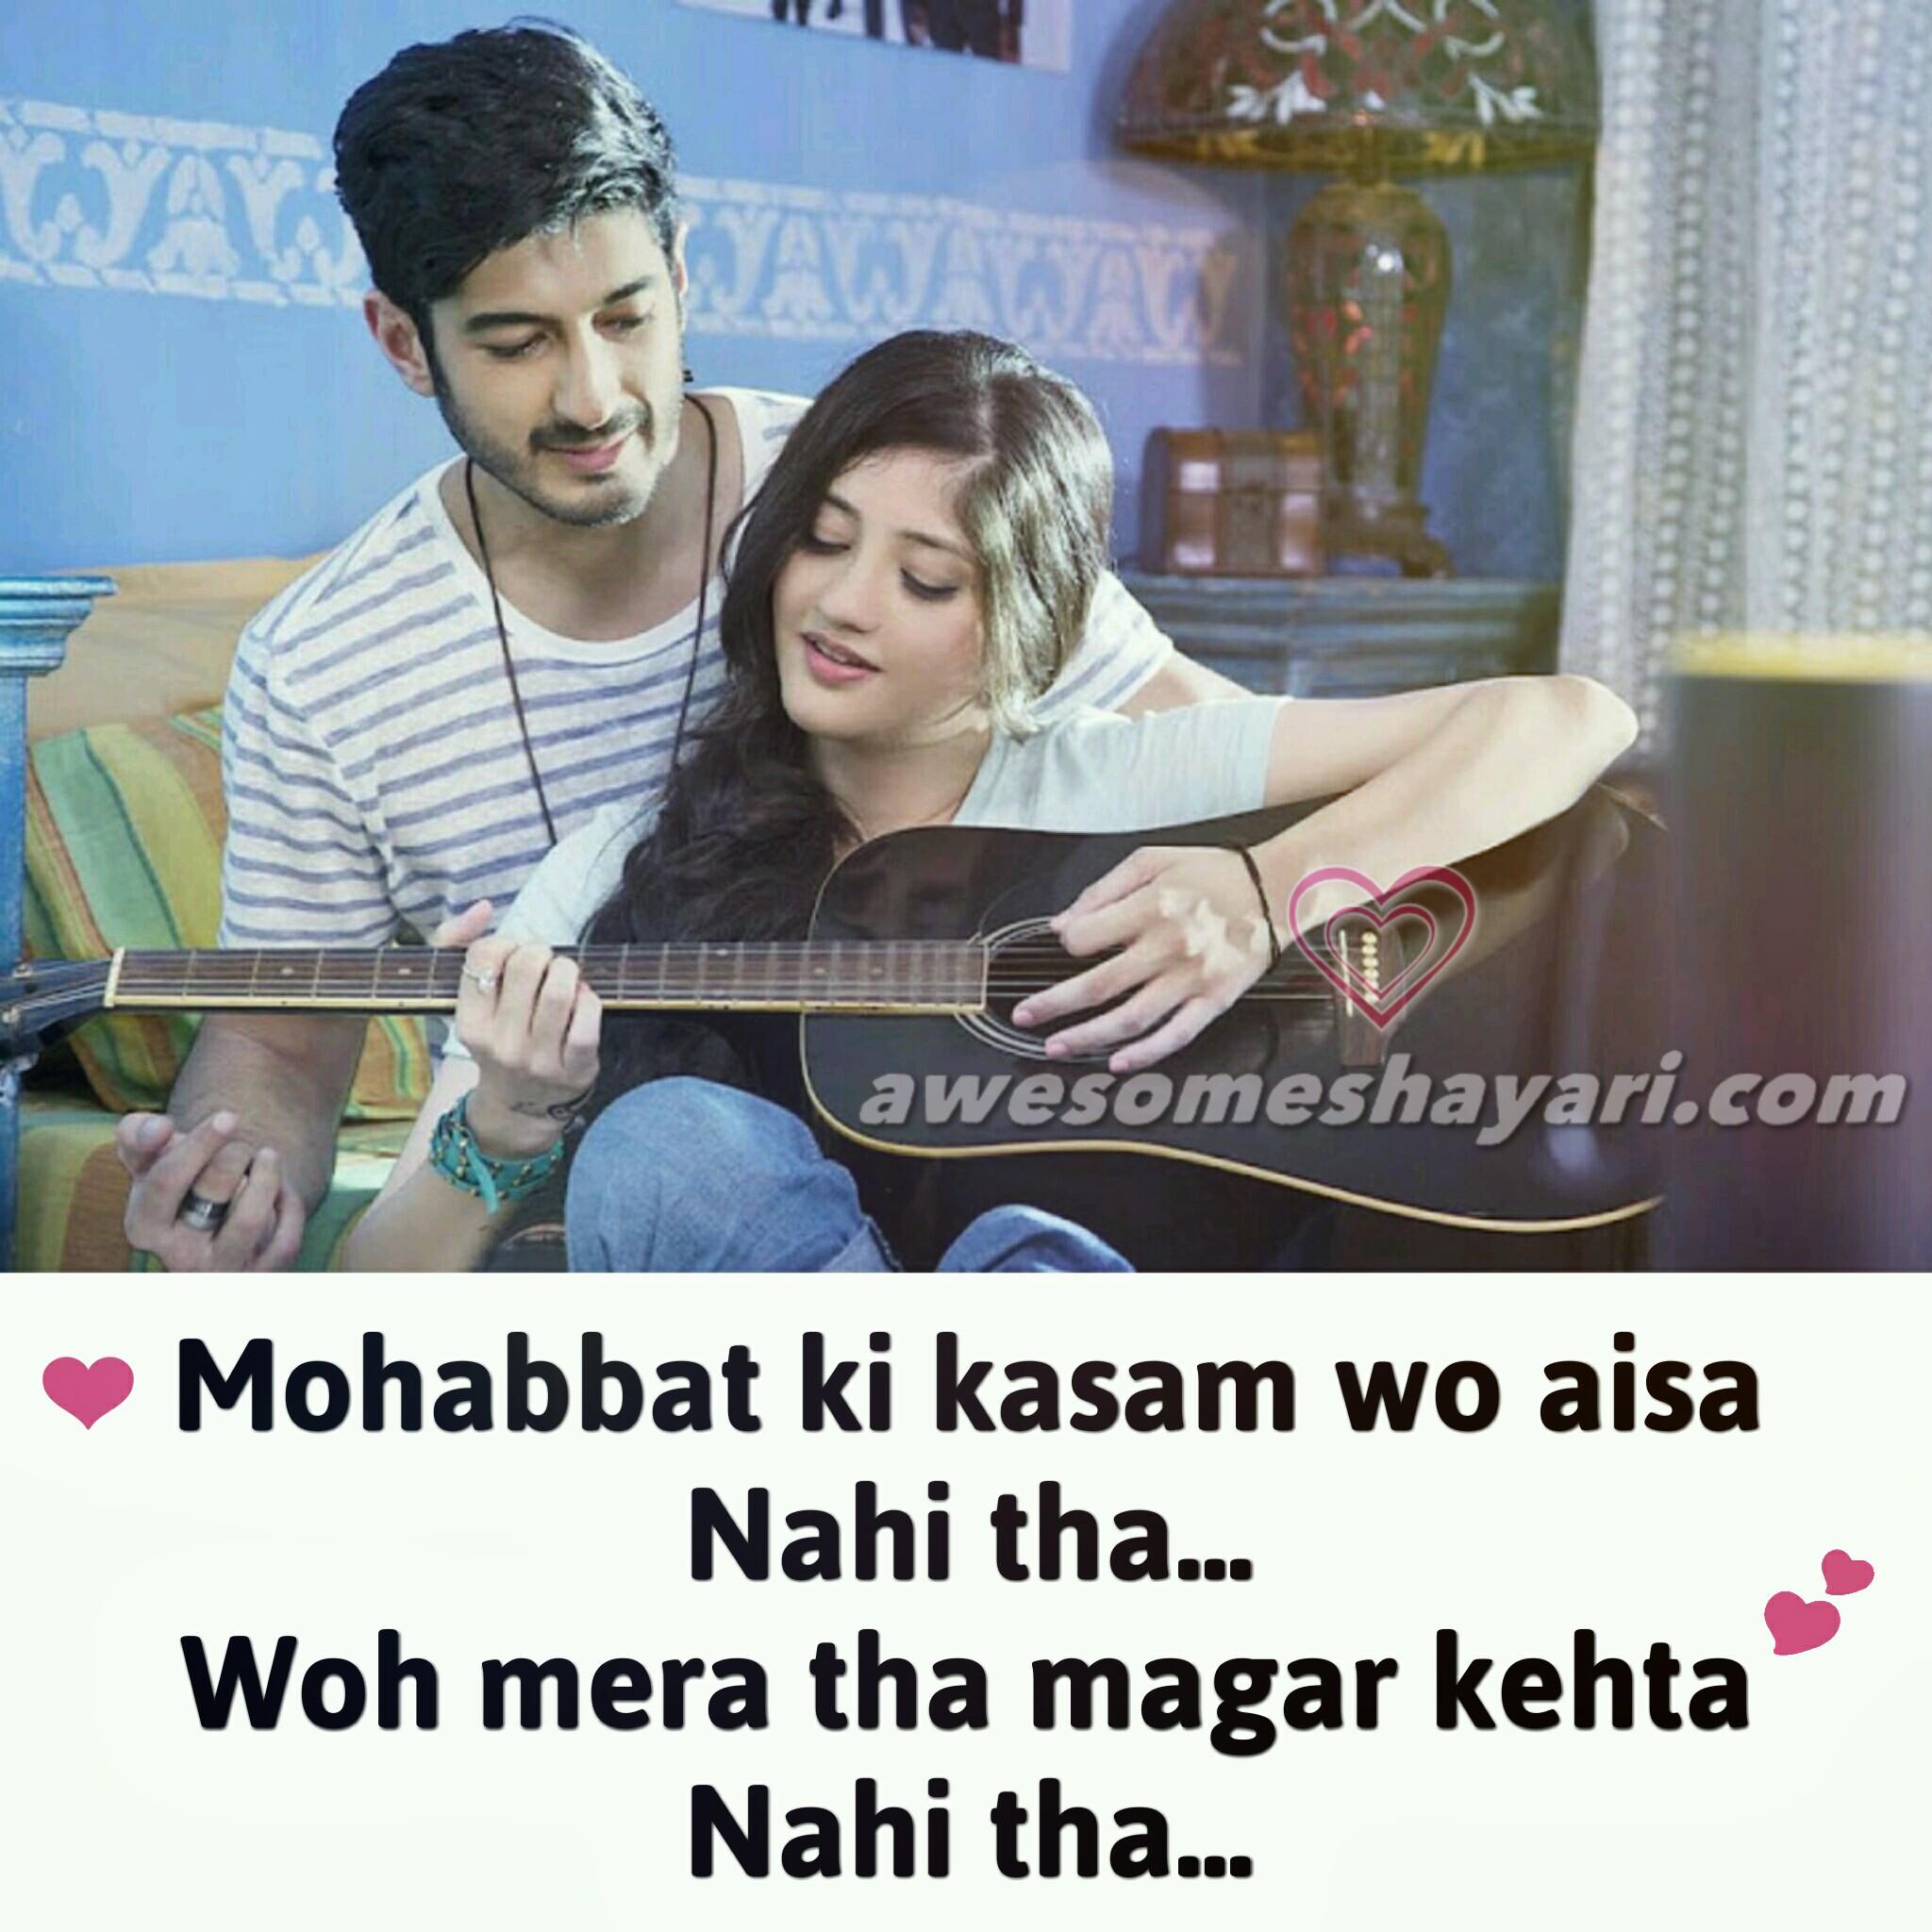 Mohabbat shayari image